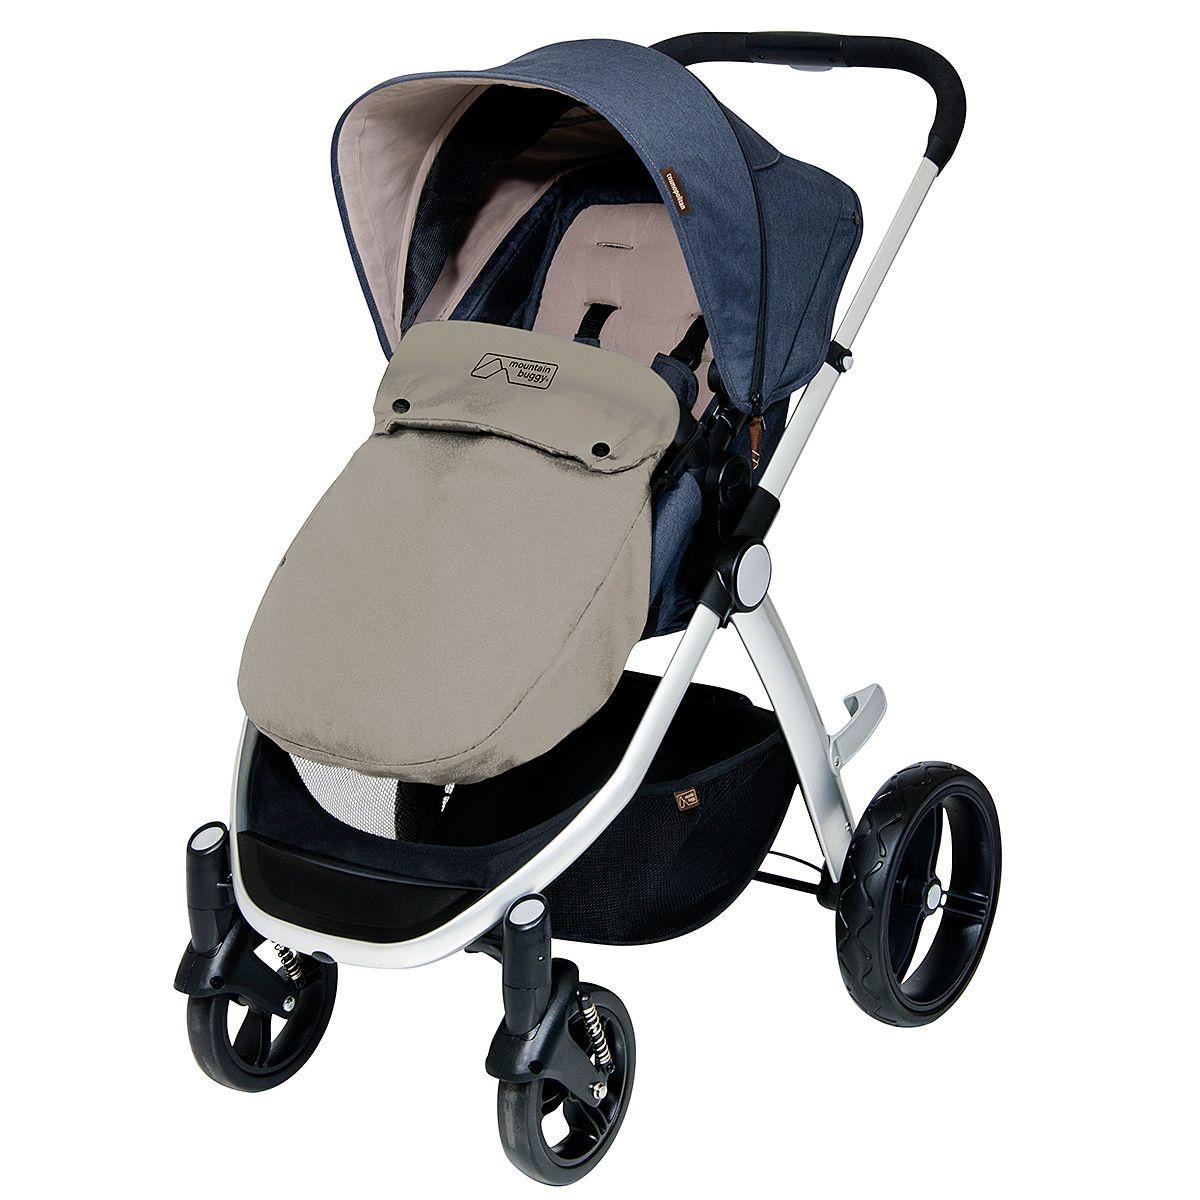 Cosmopolitan™ Baby trend jogging stroller, Stroller